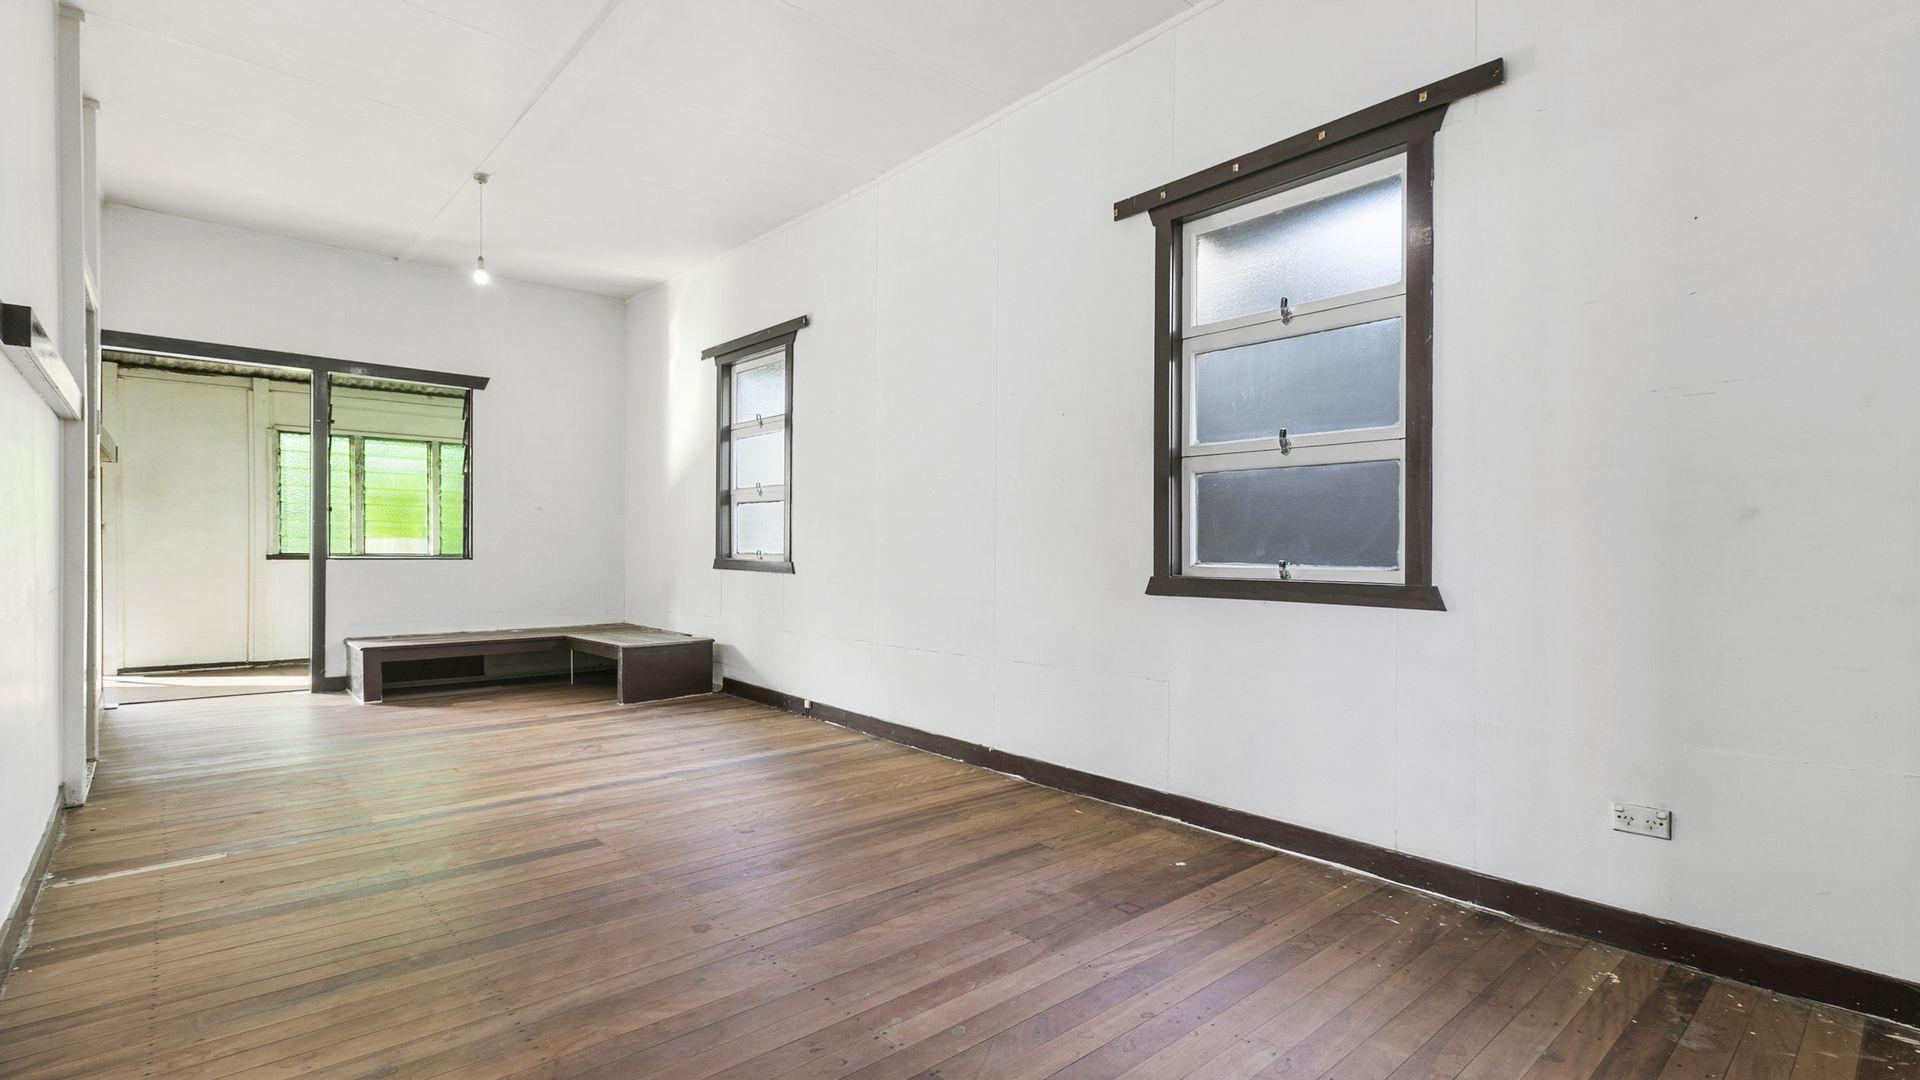 11 Harrogate Street, Woolloongabba QLD 4102, Image 1